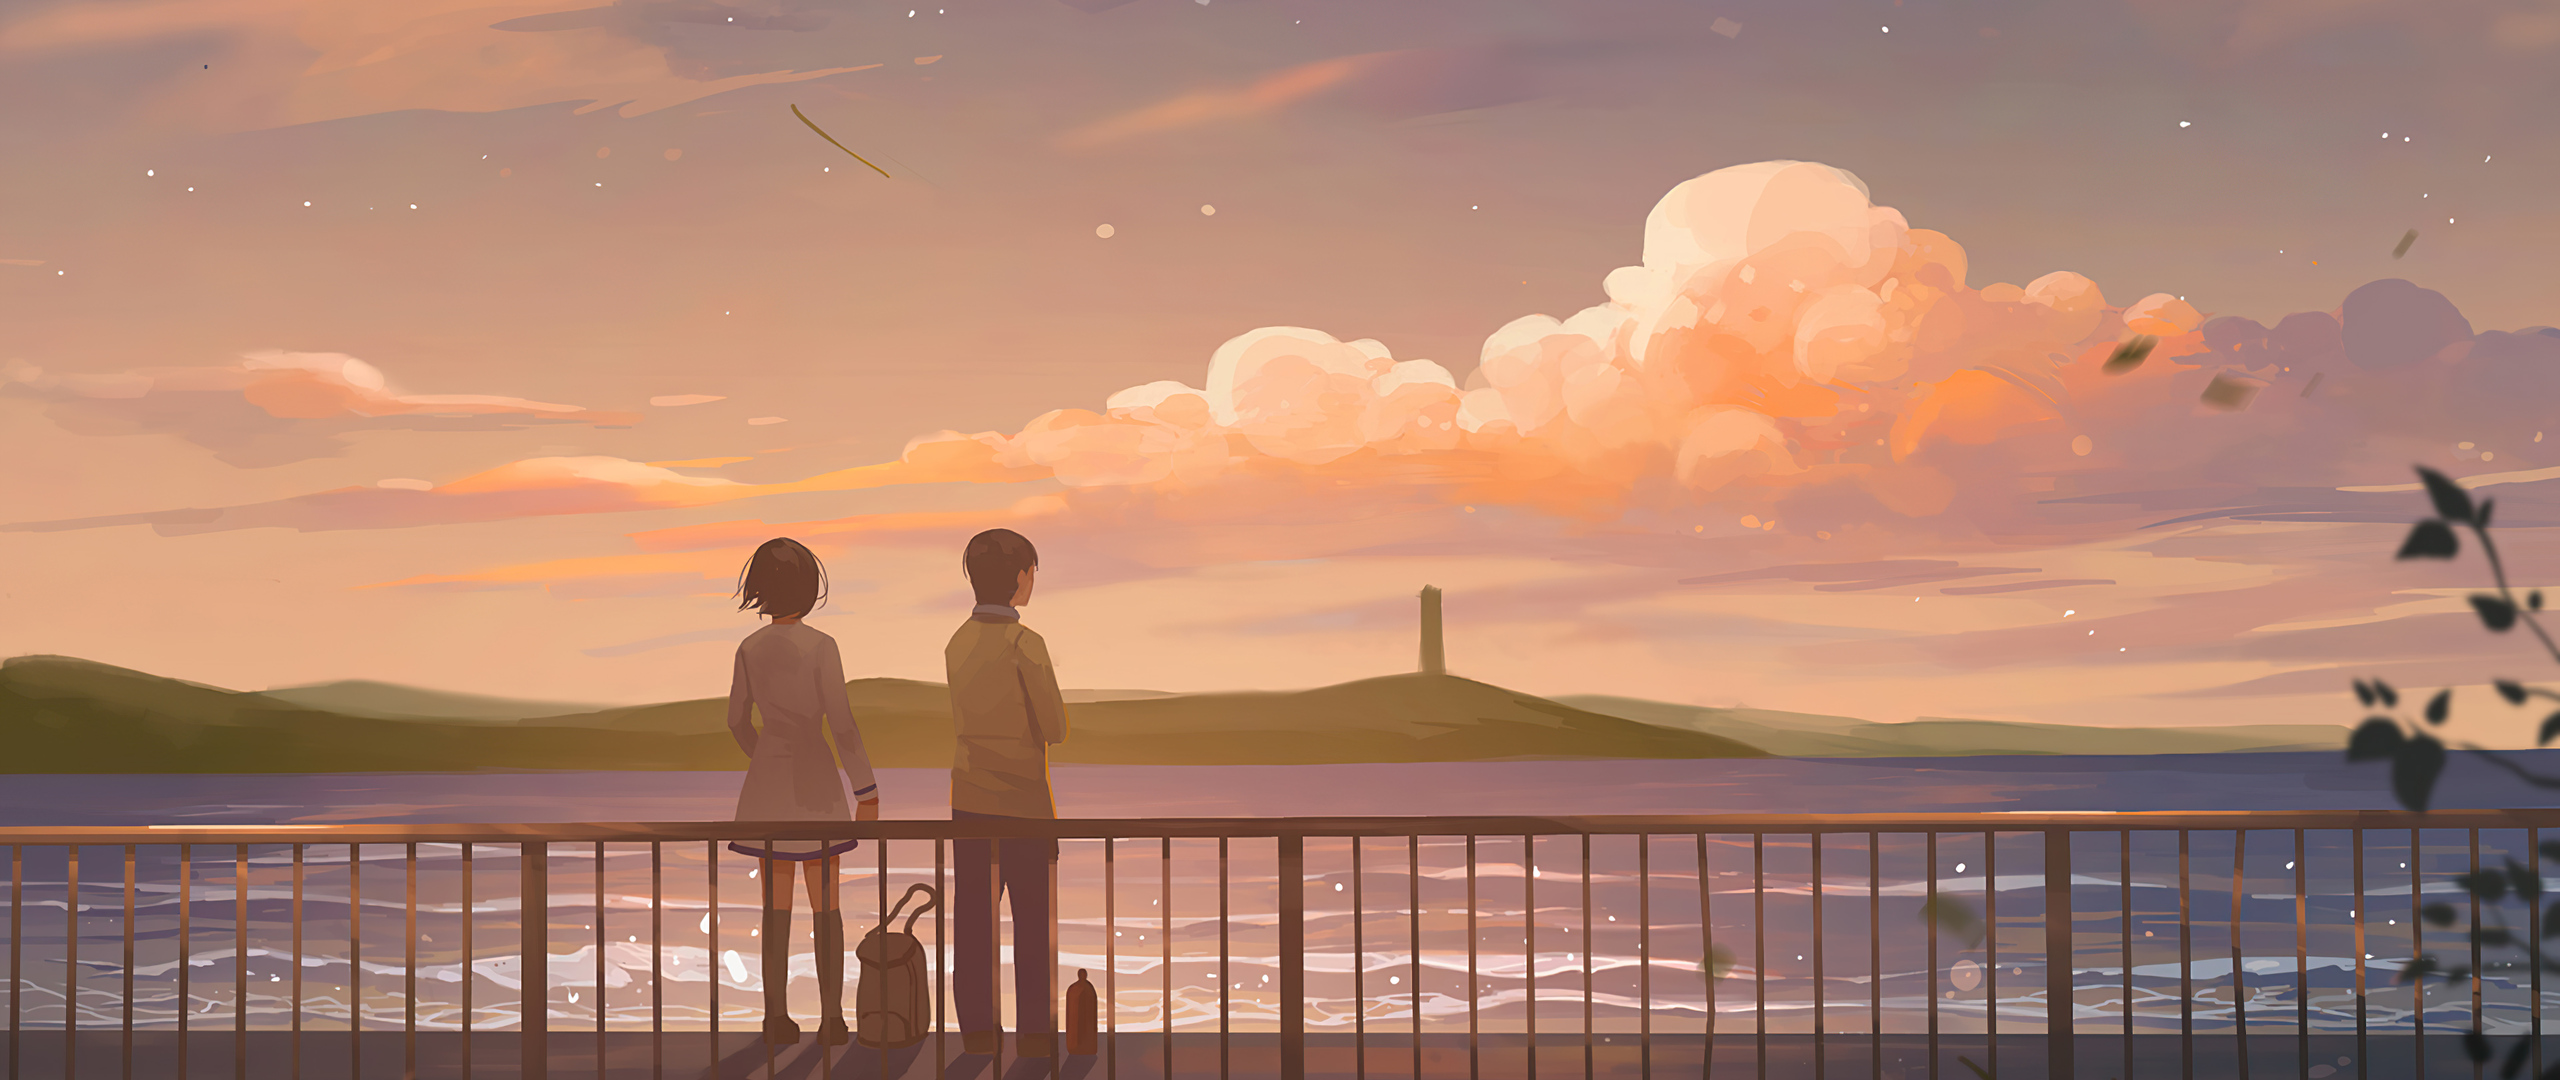 2560x1080 Anime Couple Lets Talk 4k 2560x1080 Resolution ...